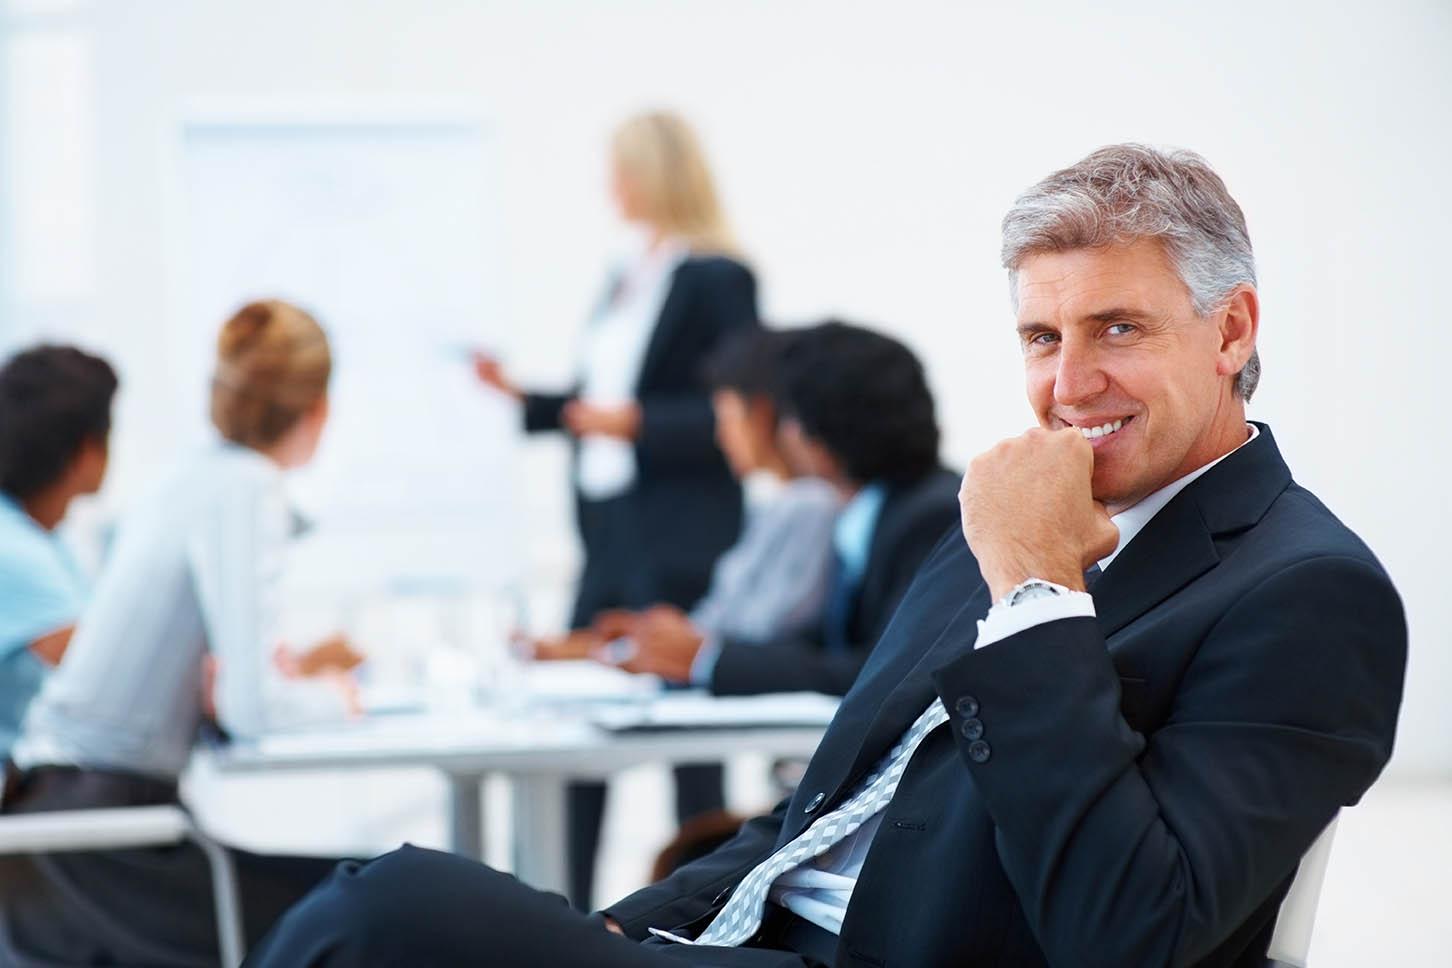 Professional English courses - Business man studying English